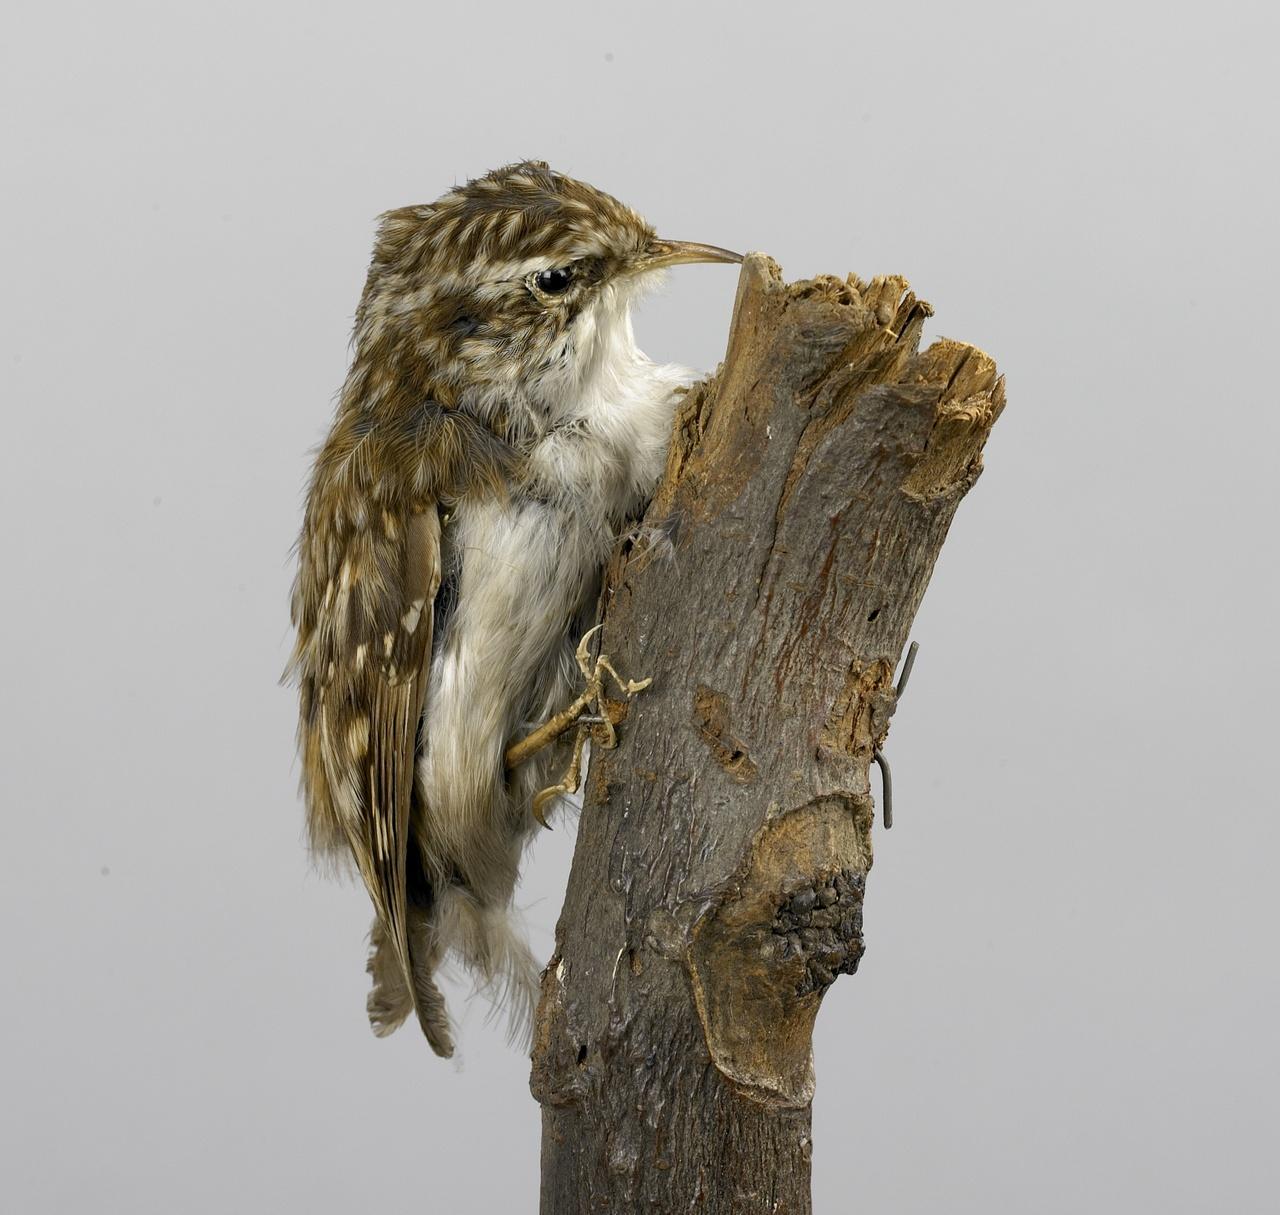 Certhia brachidactyla Brehm, 1818, Boomkruiper, opgezette vogel